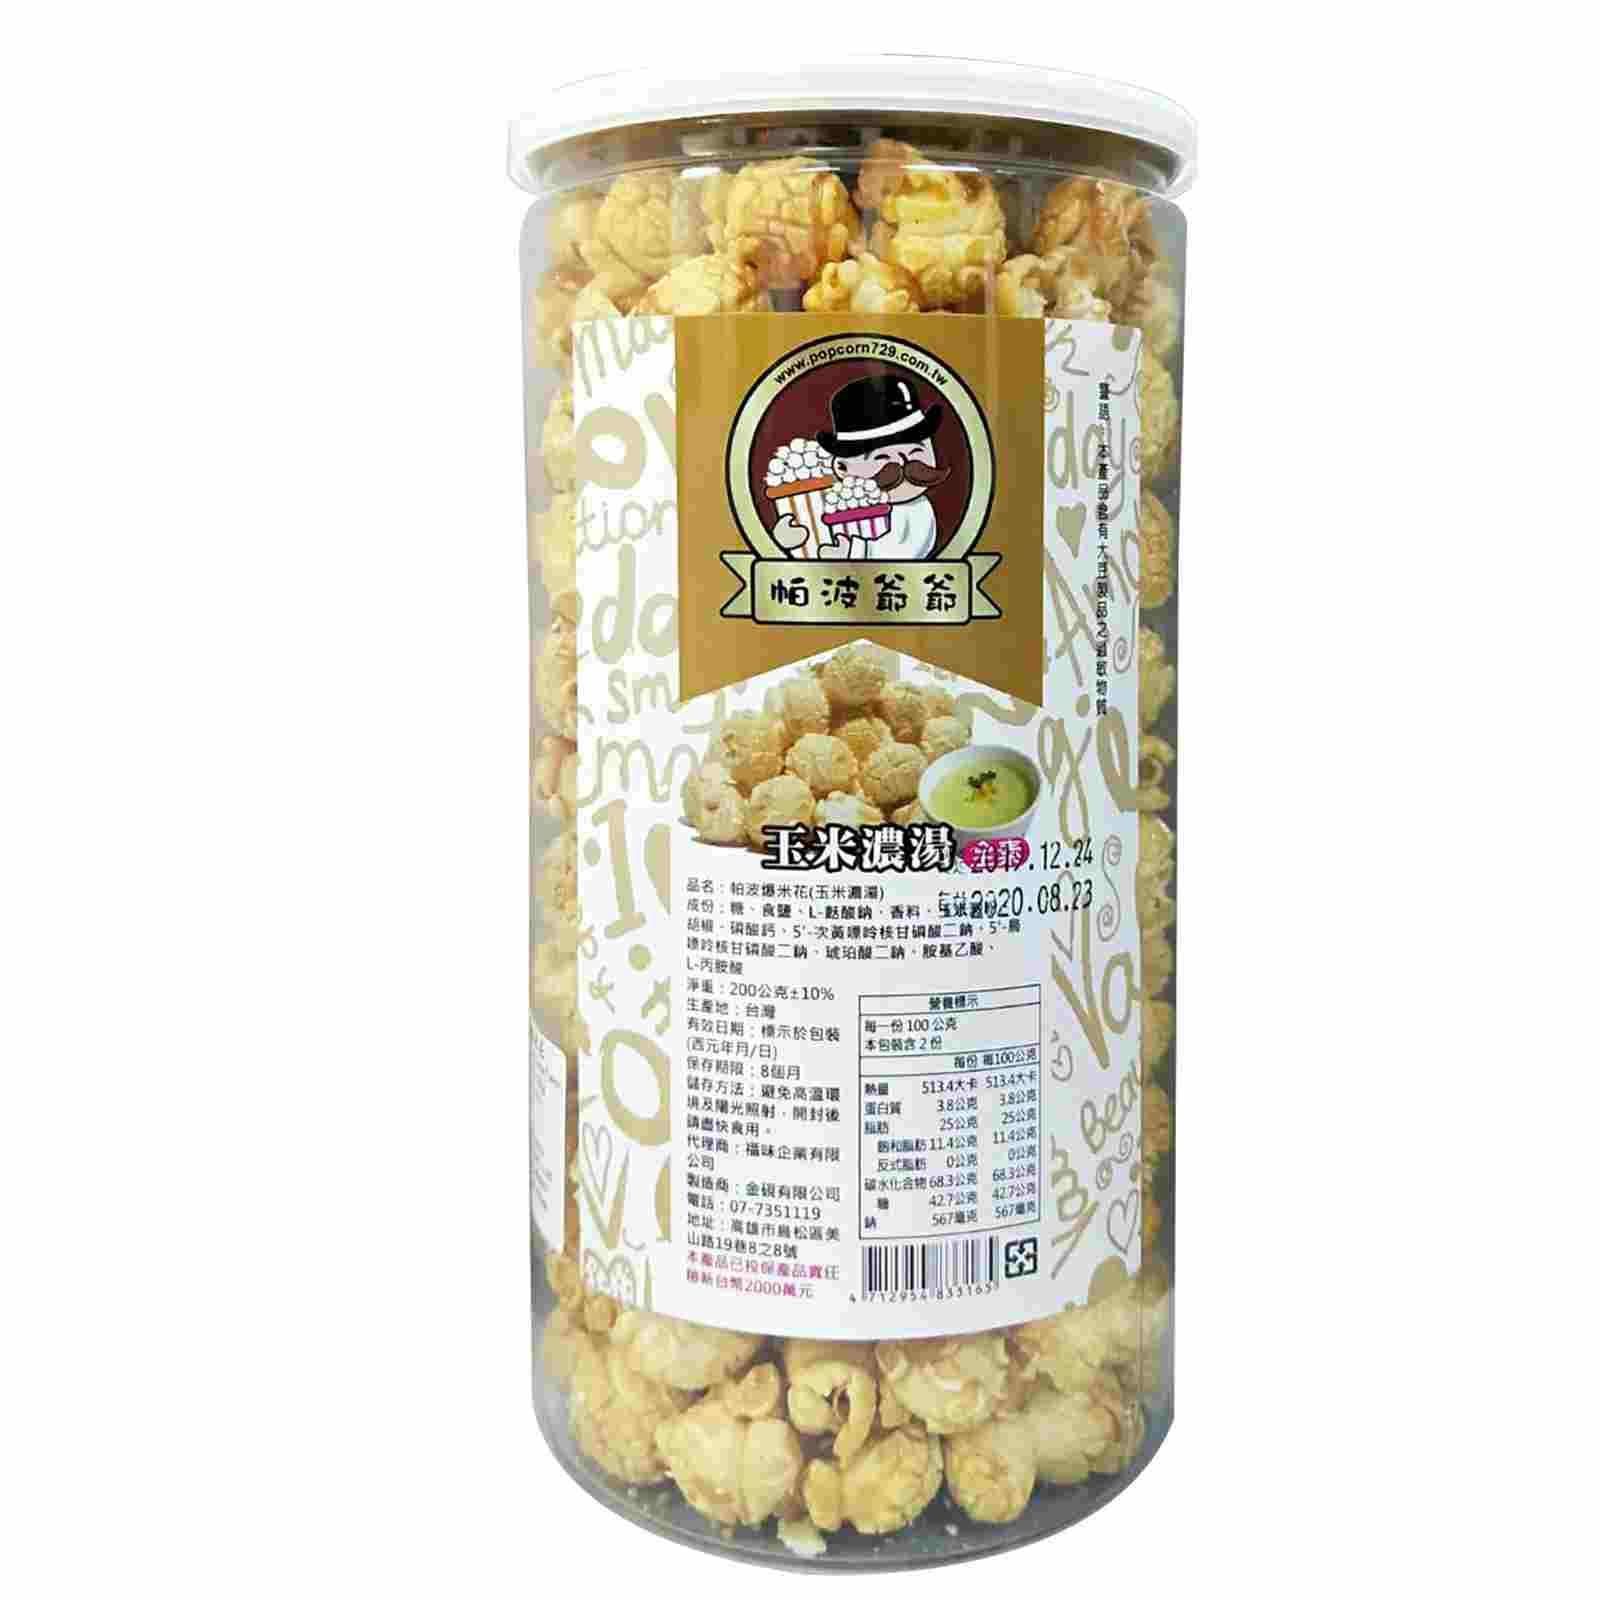 Image Papo Popcorn Vegan Corn soup 金砚-玉米濃湯爆米花 200grams